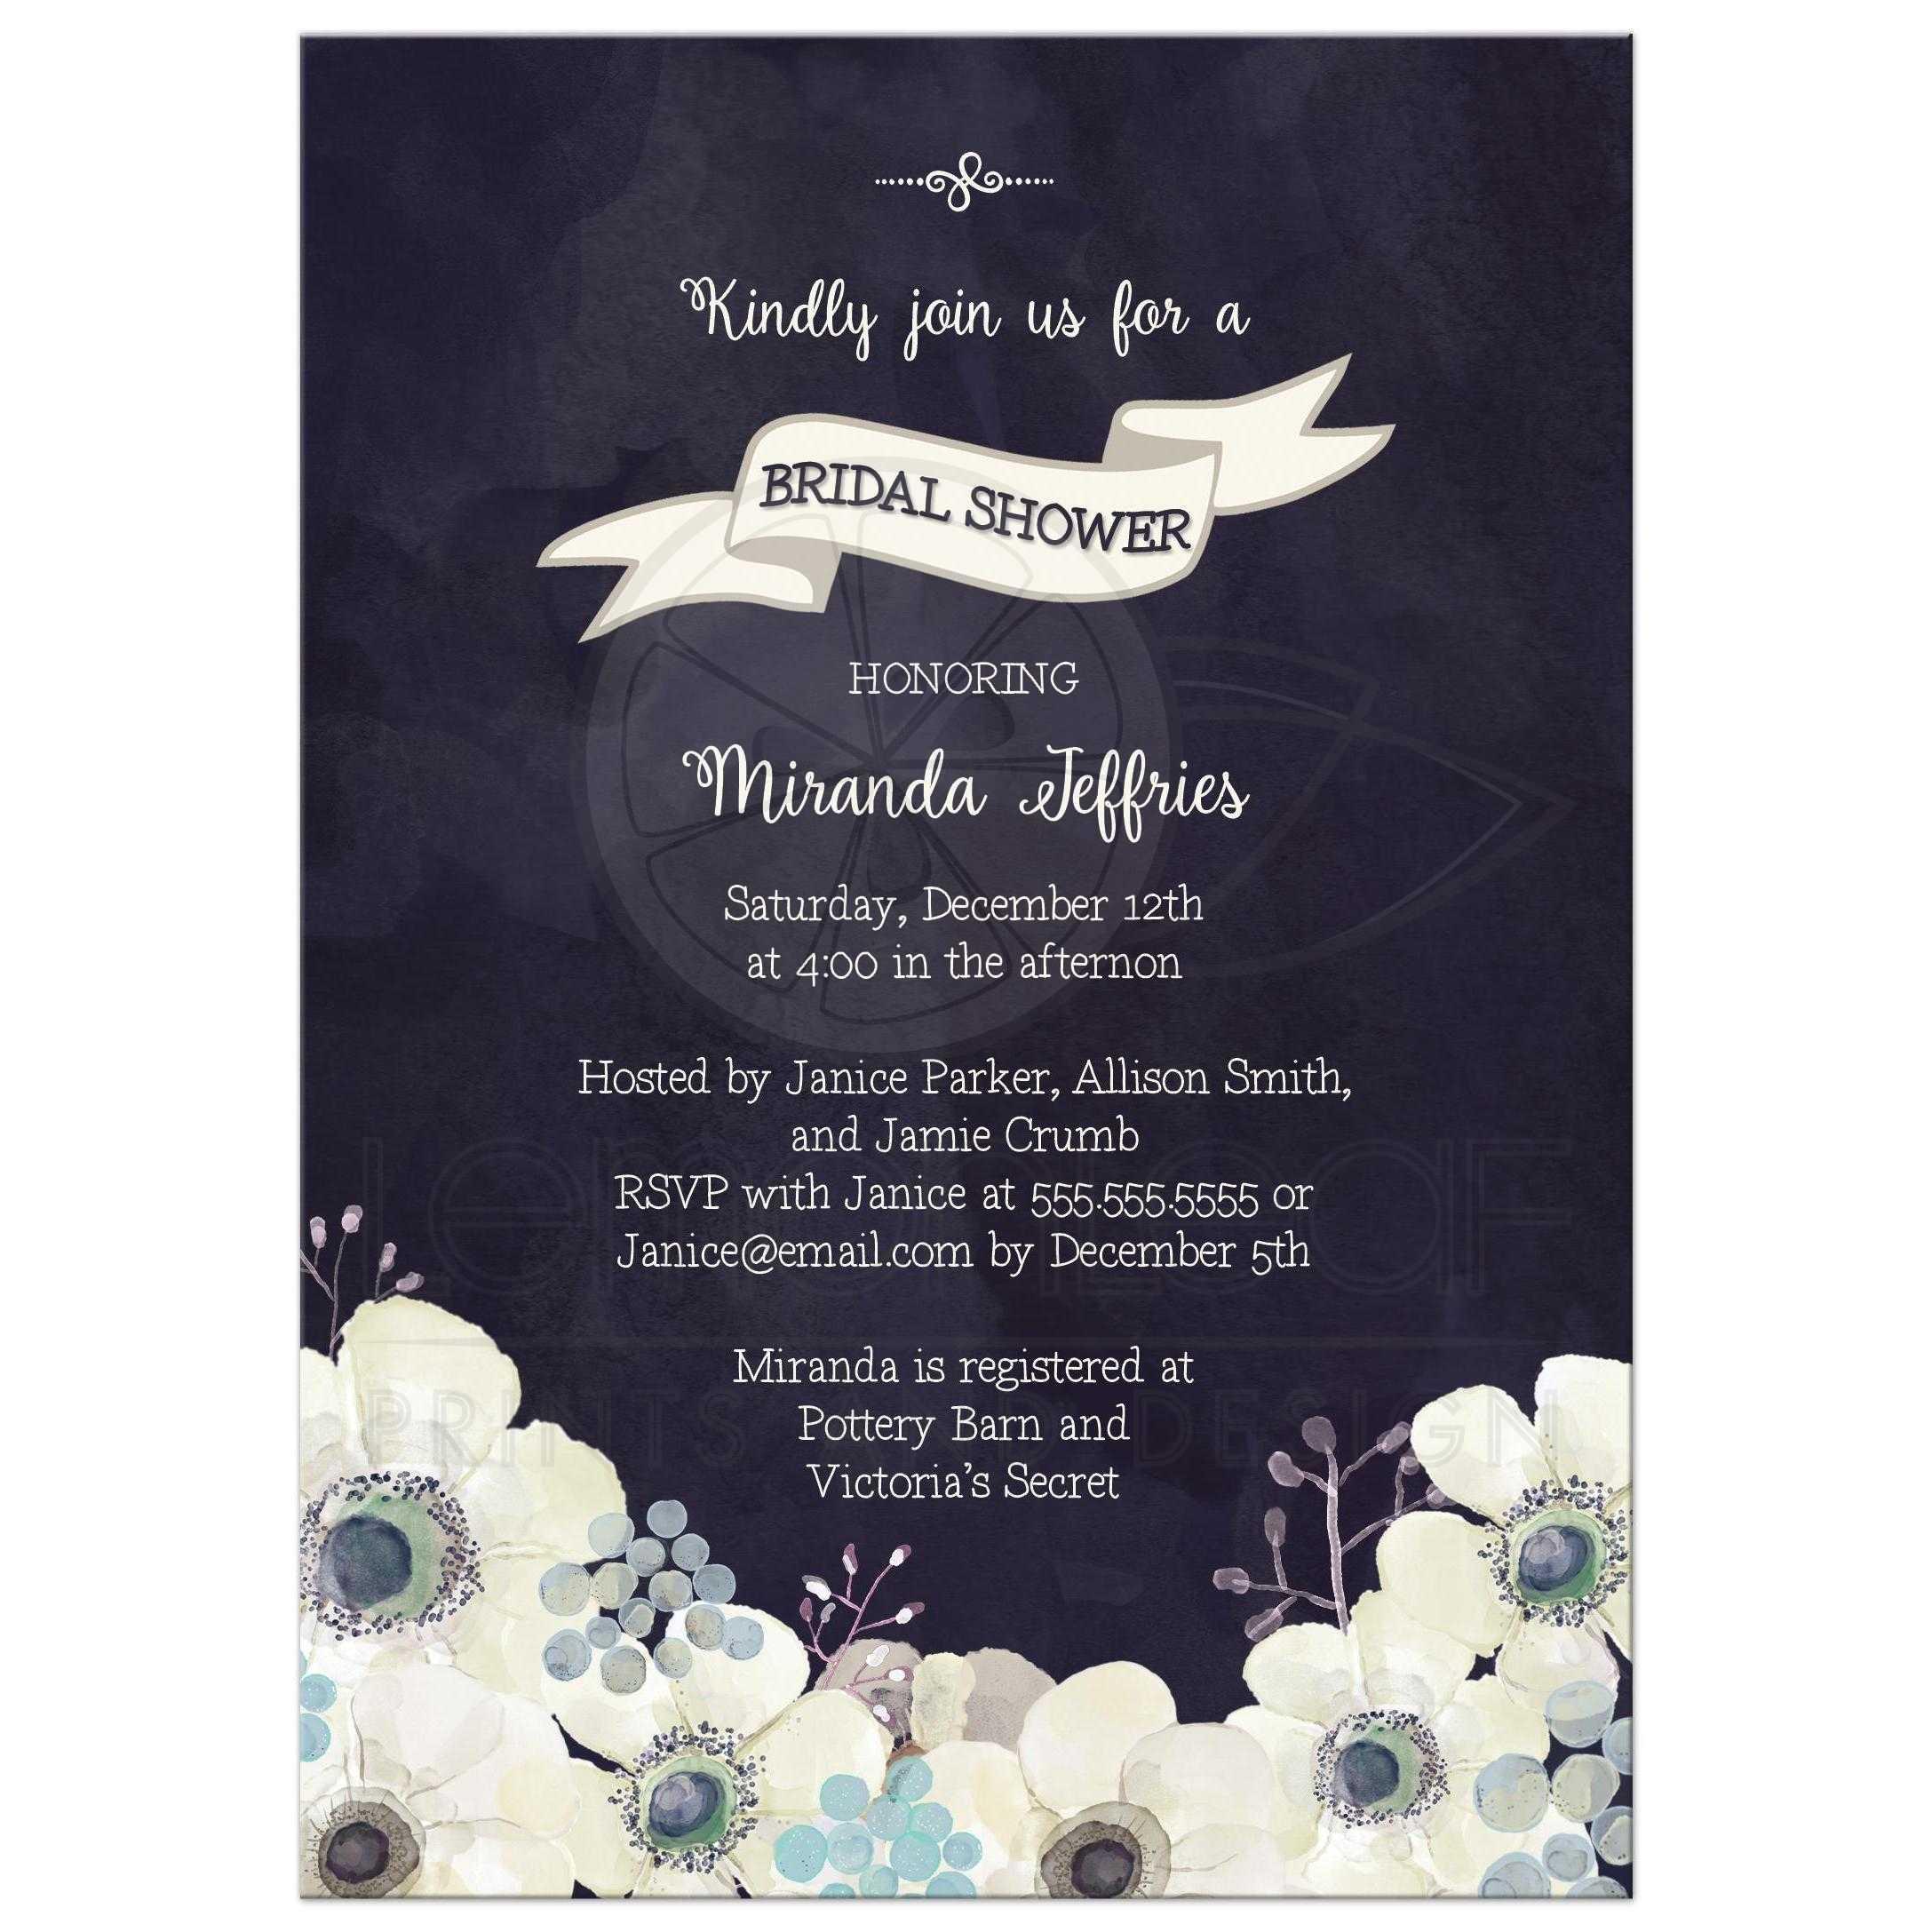 Bridal shower invitation watercolor midnight blue purple gray flowers midnight blue and plum purple floral bridal shower invite izmirmasajfo